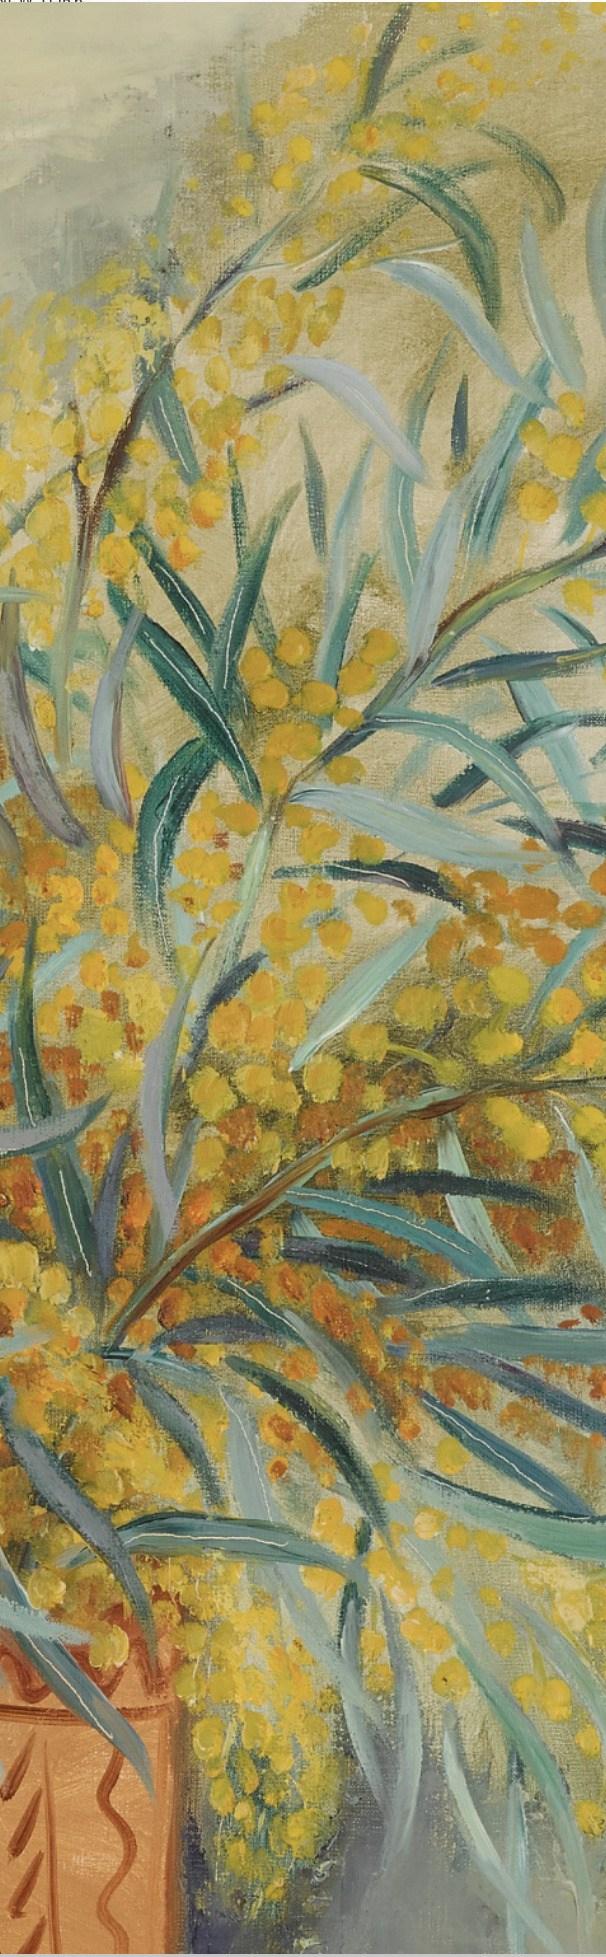 Screenshot_2018-12-05 rubin, reuven mimosas in an a still life sotheby's n09638lot9mkxcen